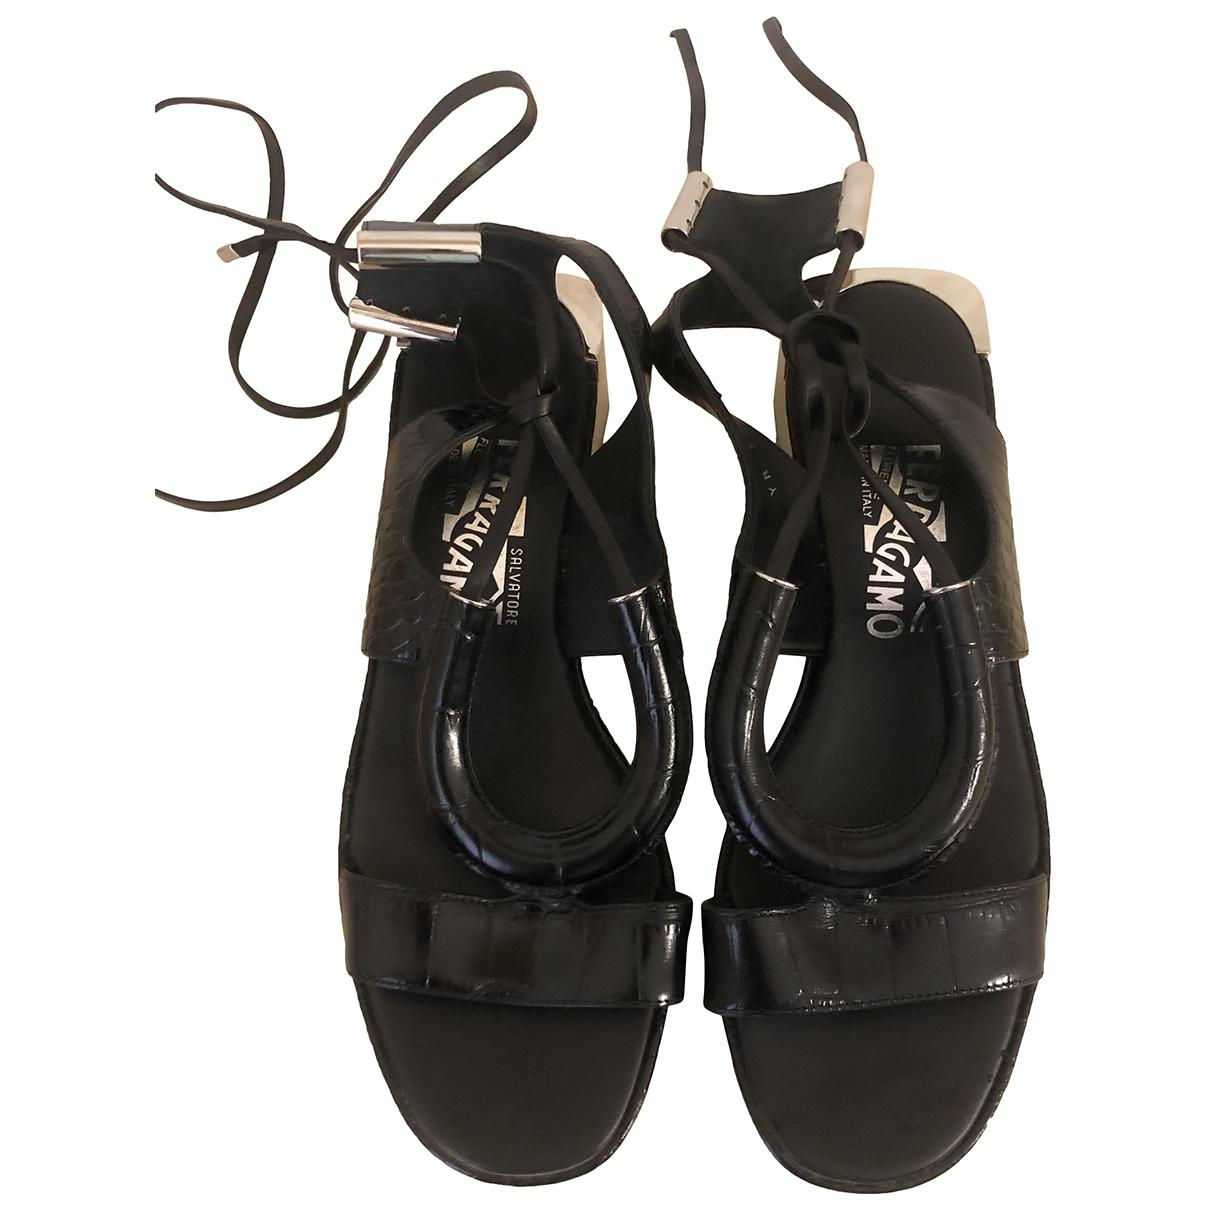 Salvatore Ferragamo \N Black Leather Sandals for Women 6.5 US